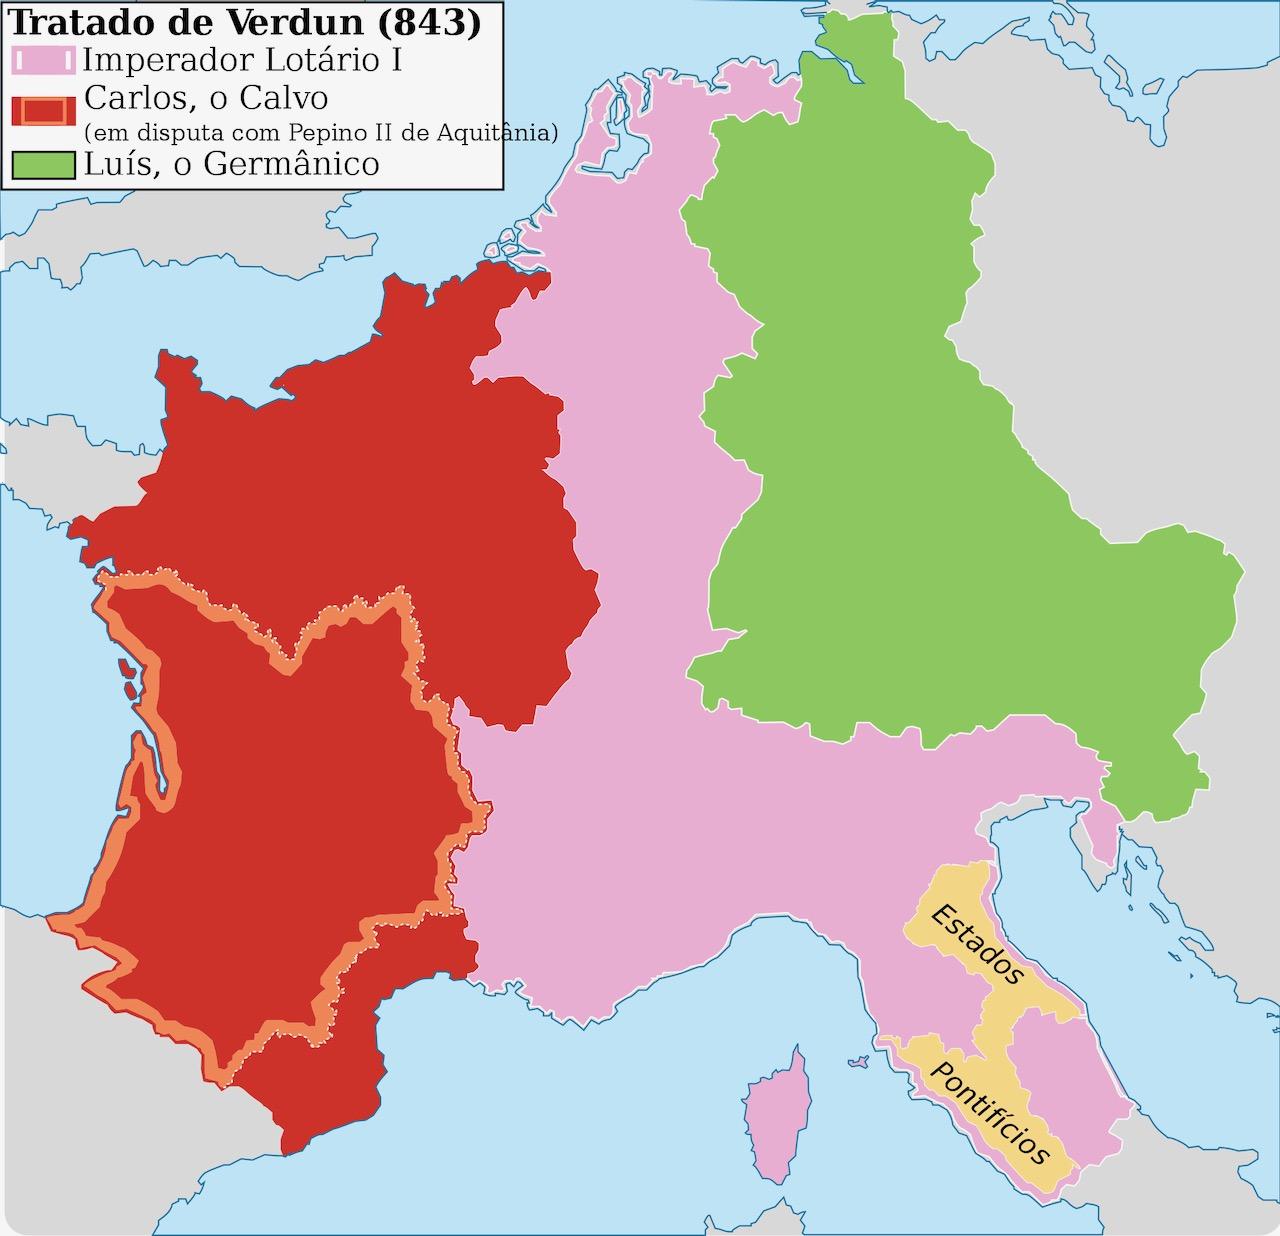 Imperio Carolingio 843 mapa